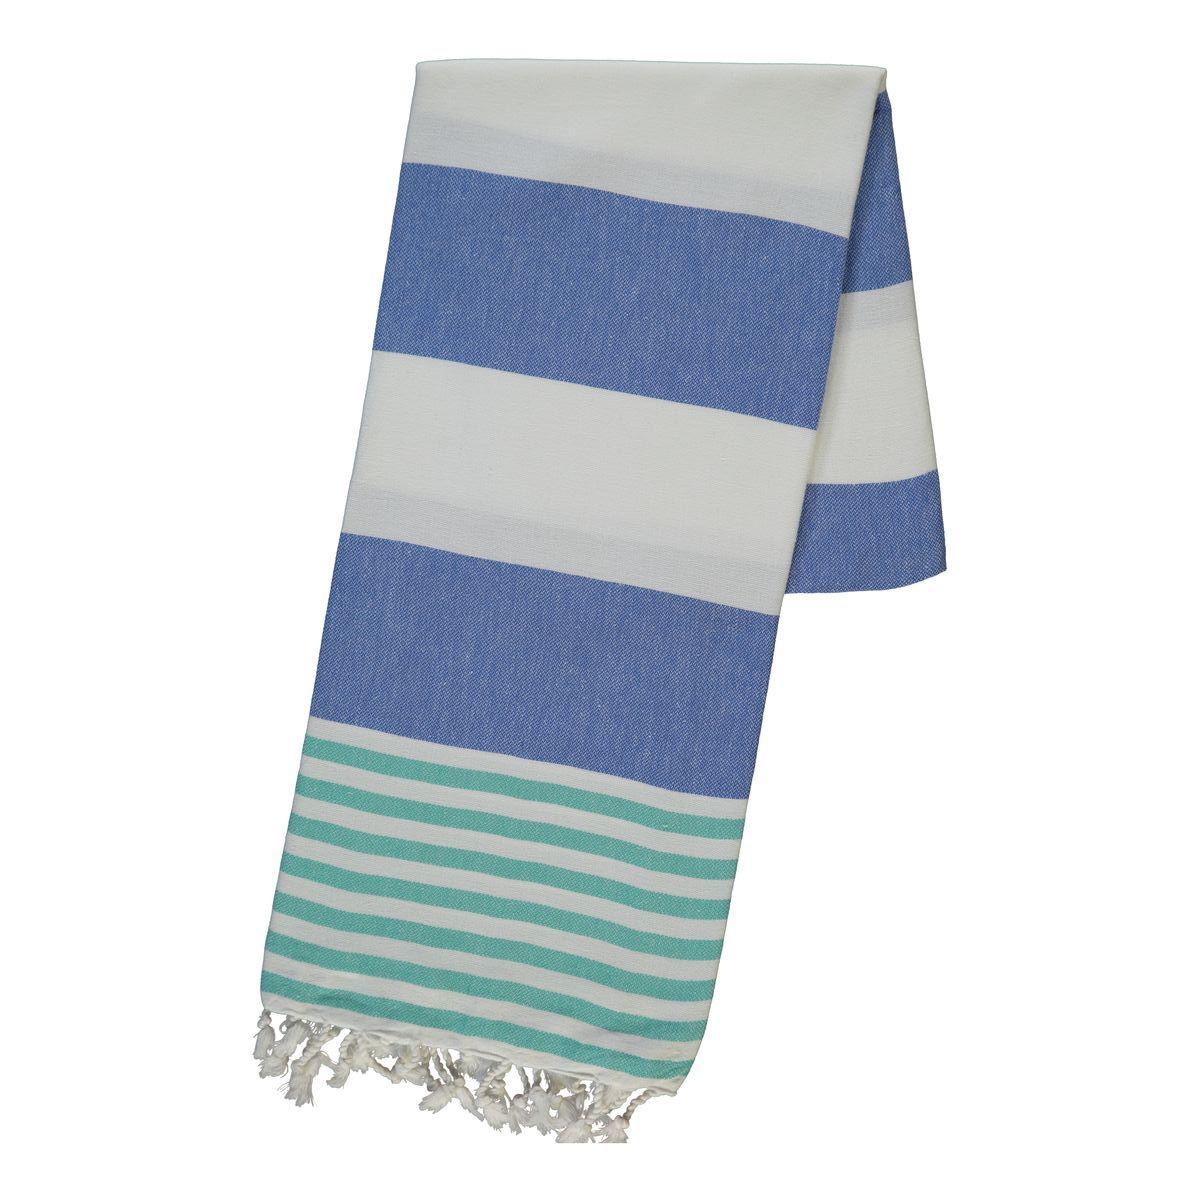 Peshtemal Ladon03 - Green / Royal Blue